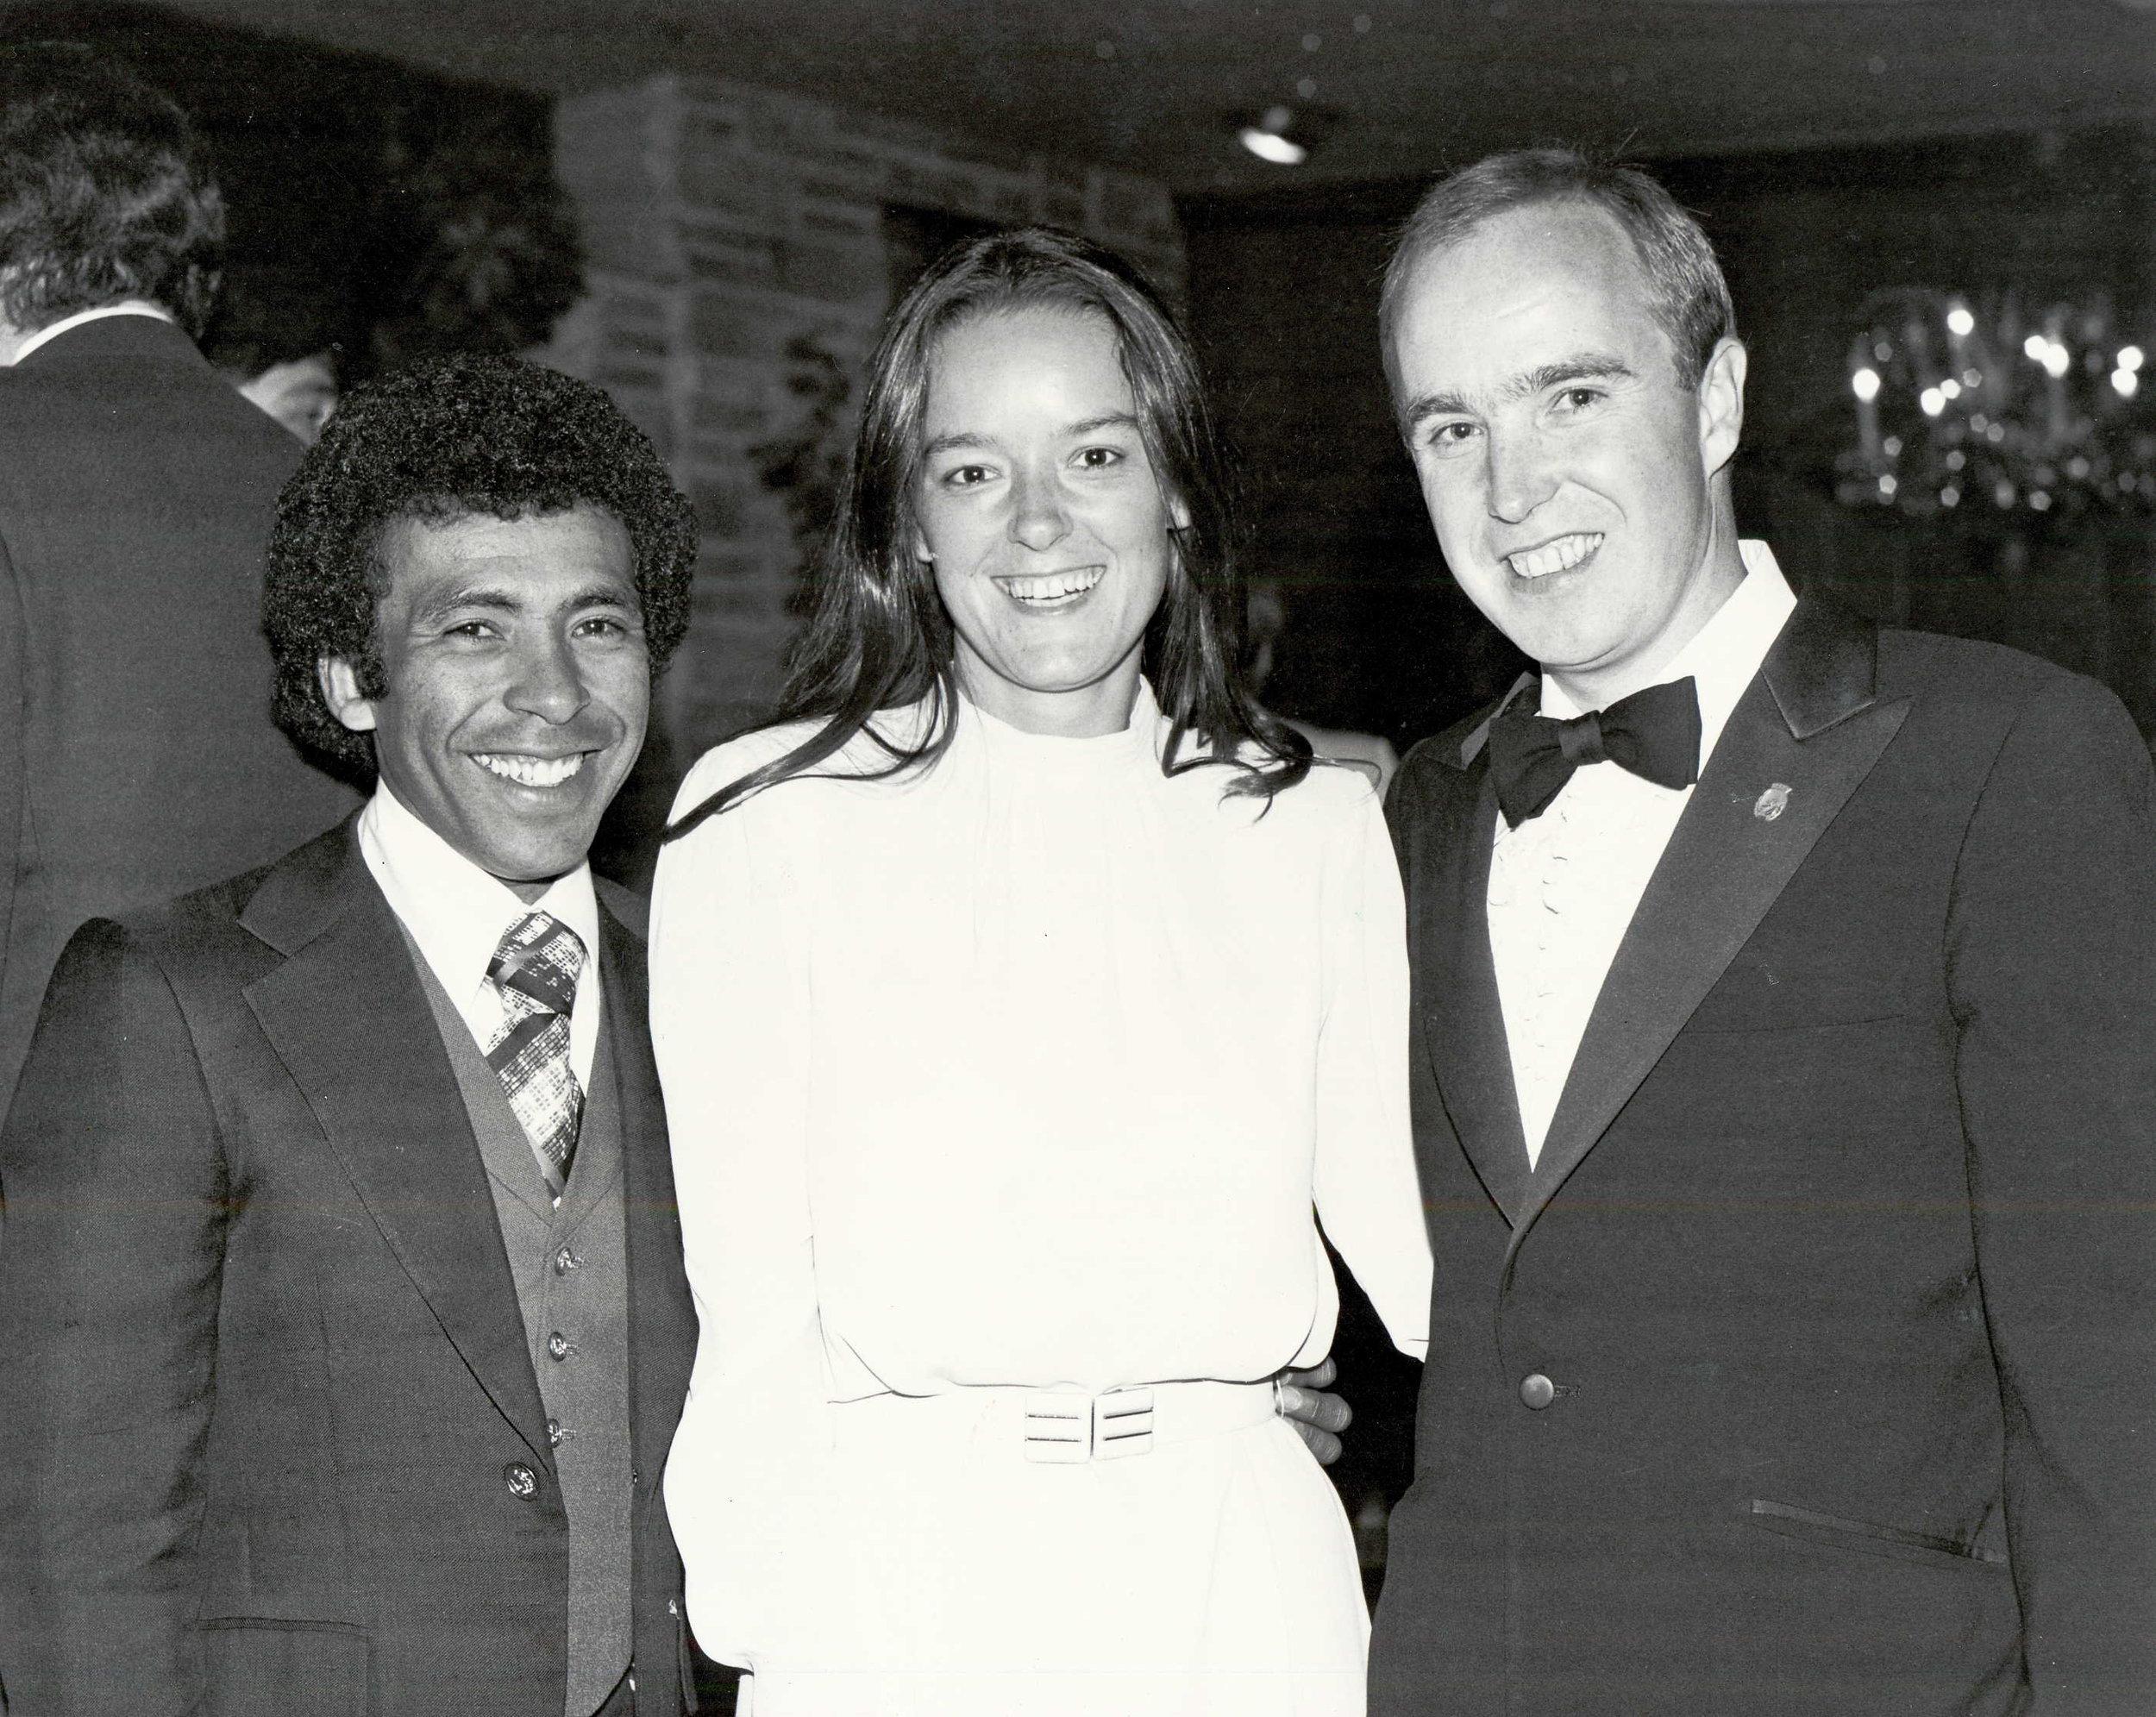 Angel Cordero, Janis Maine and Reade in 1977